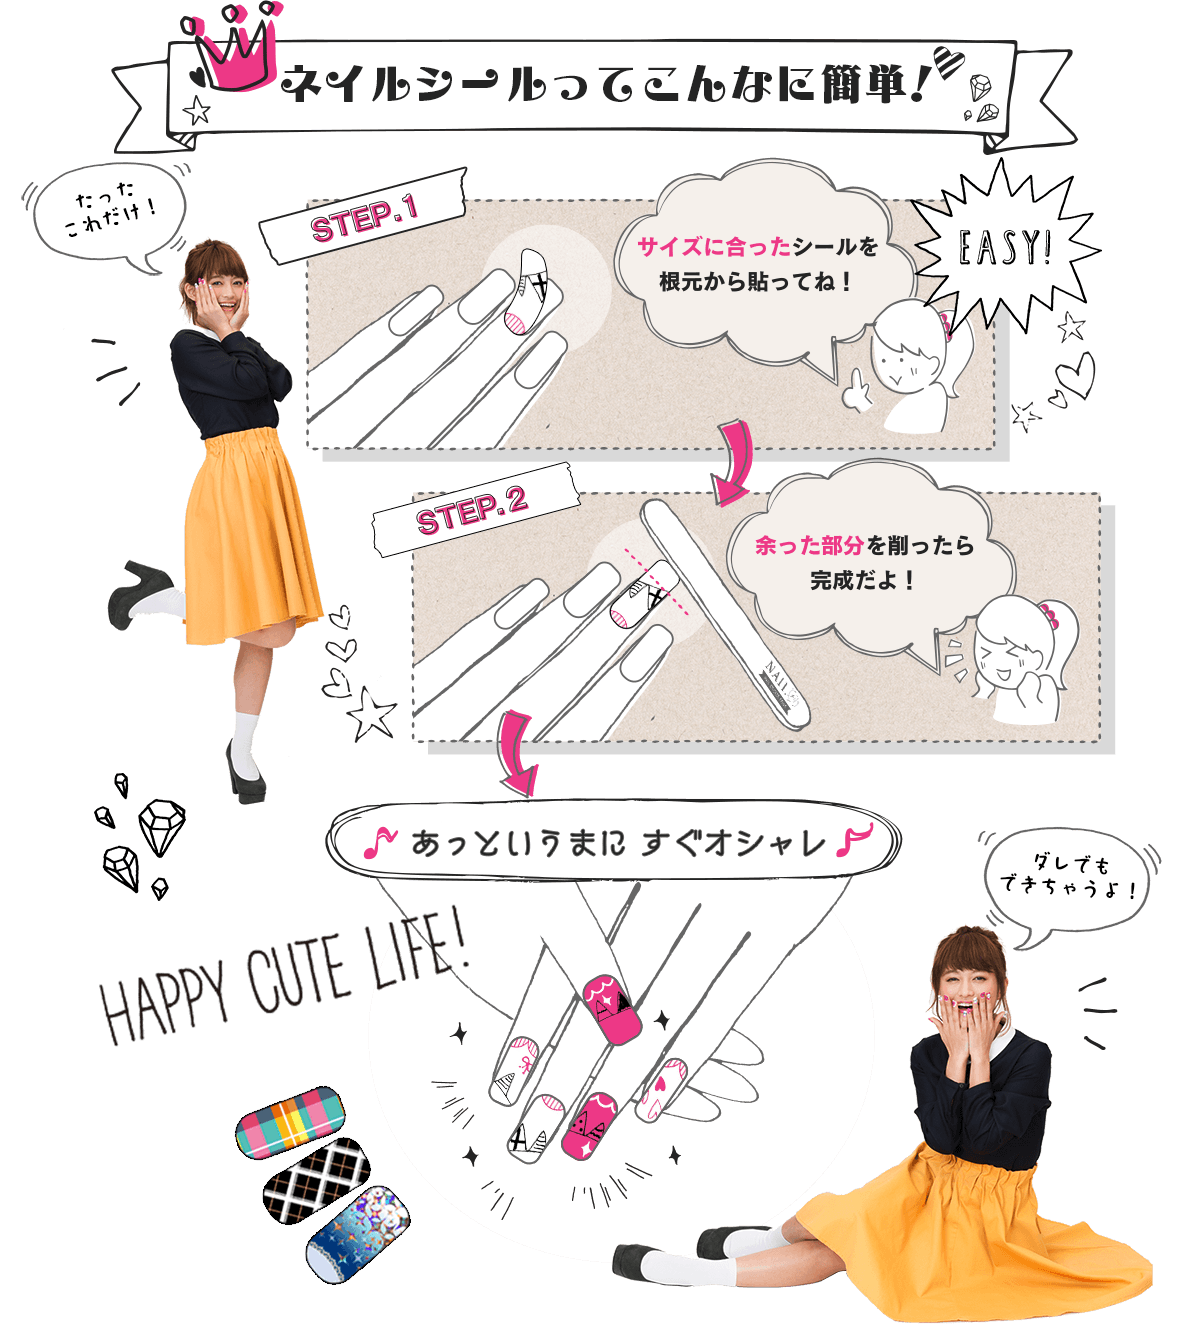 nail-art-puri-sticker-sega-printer-booth-2